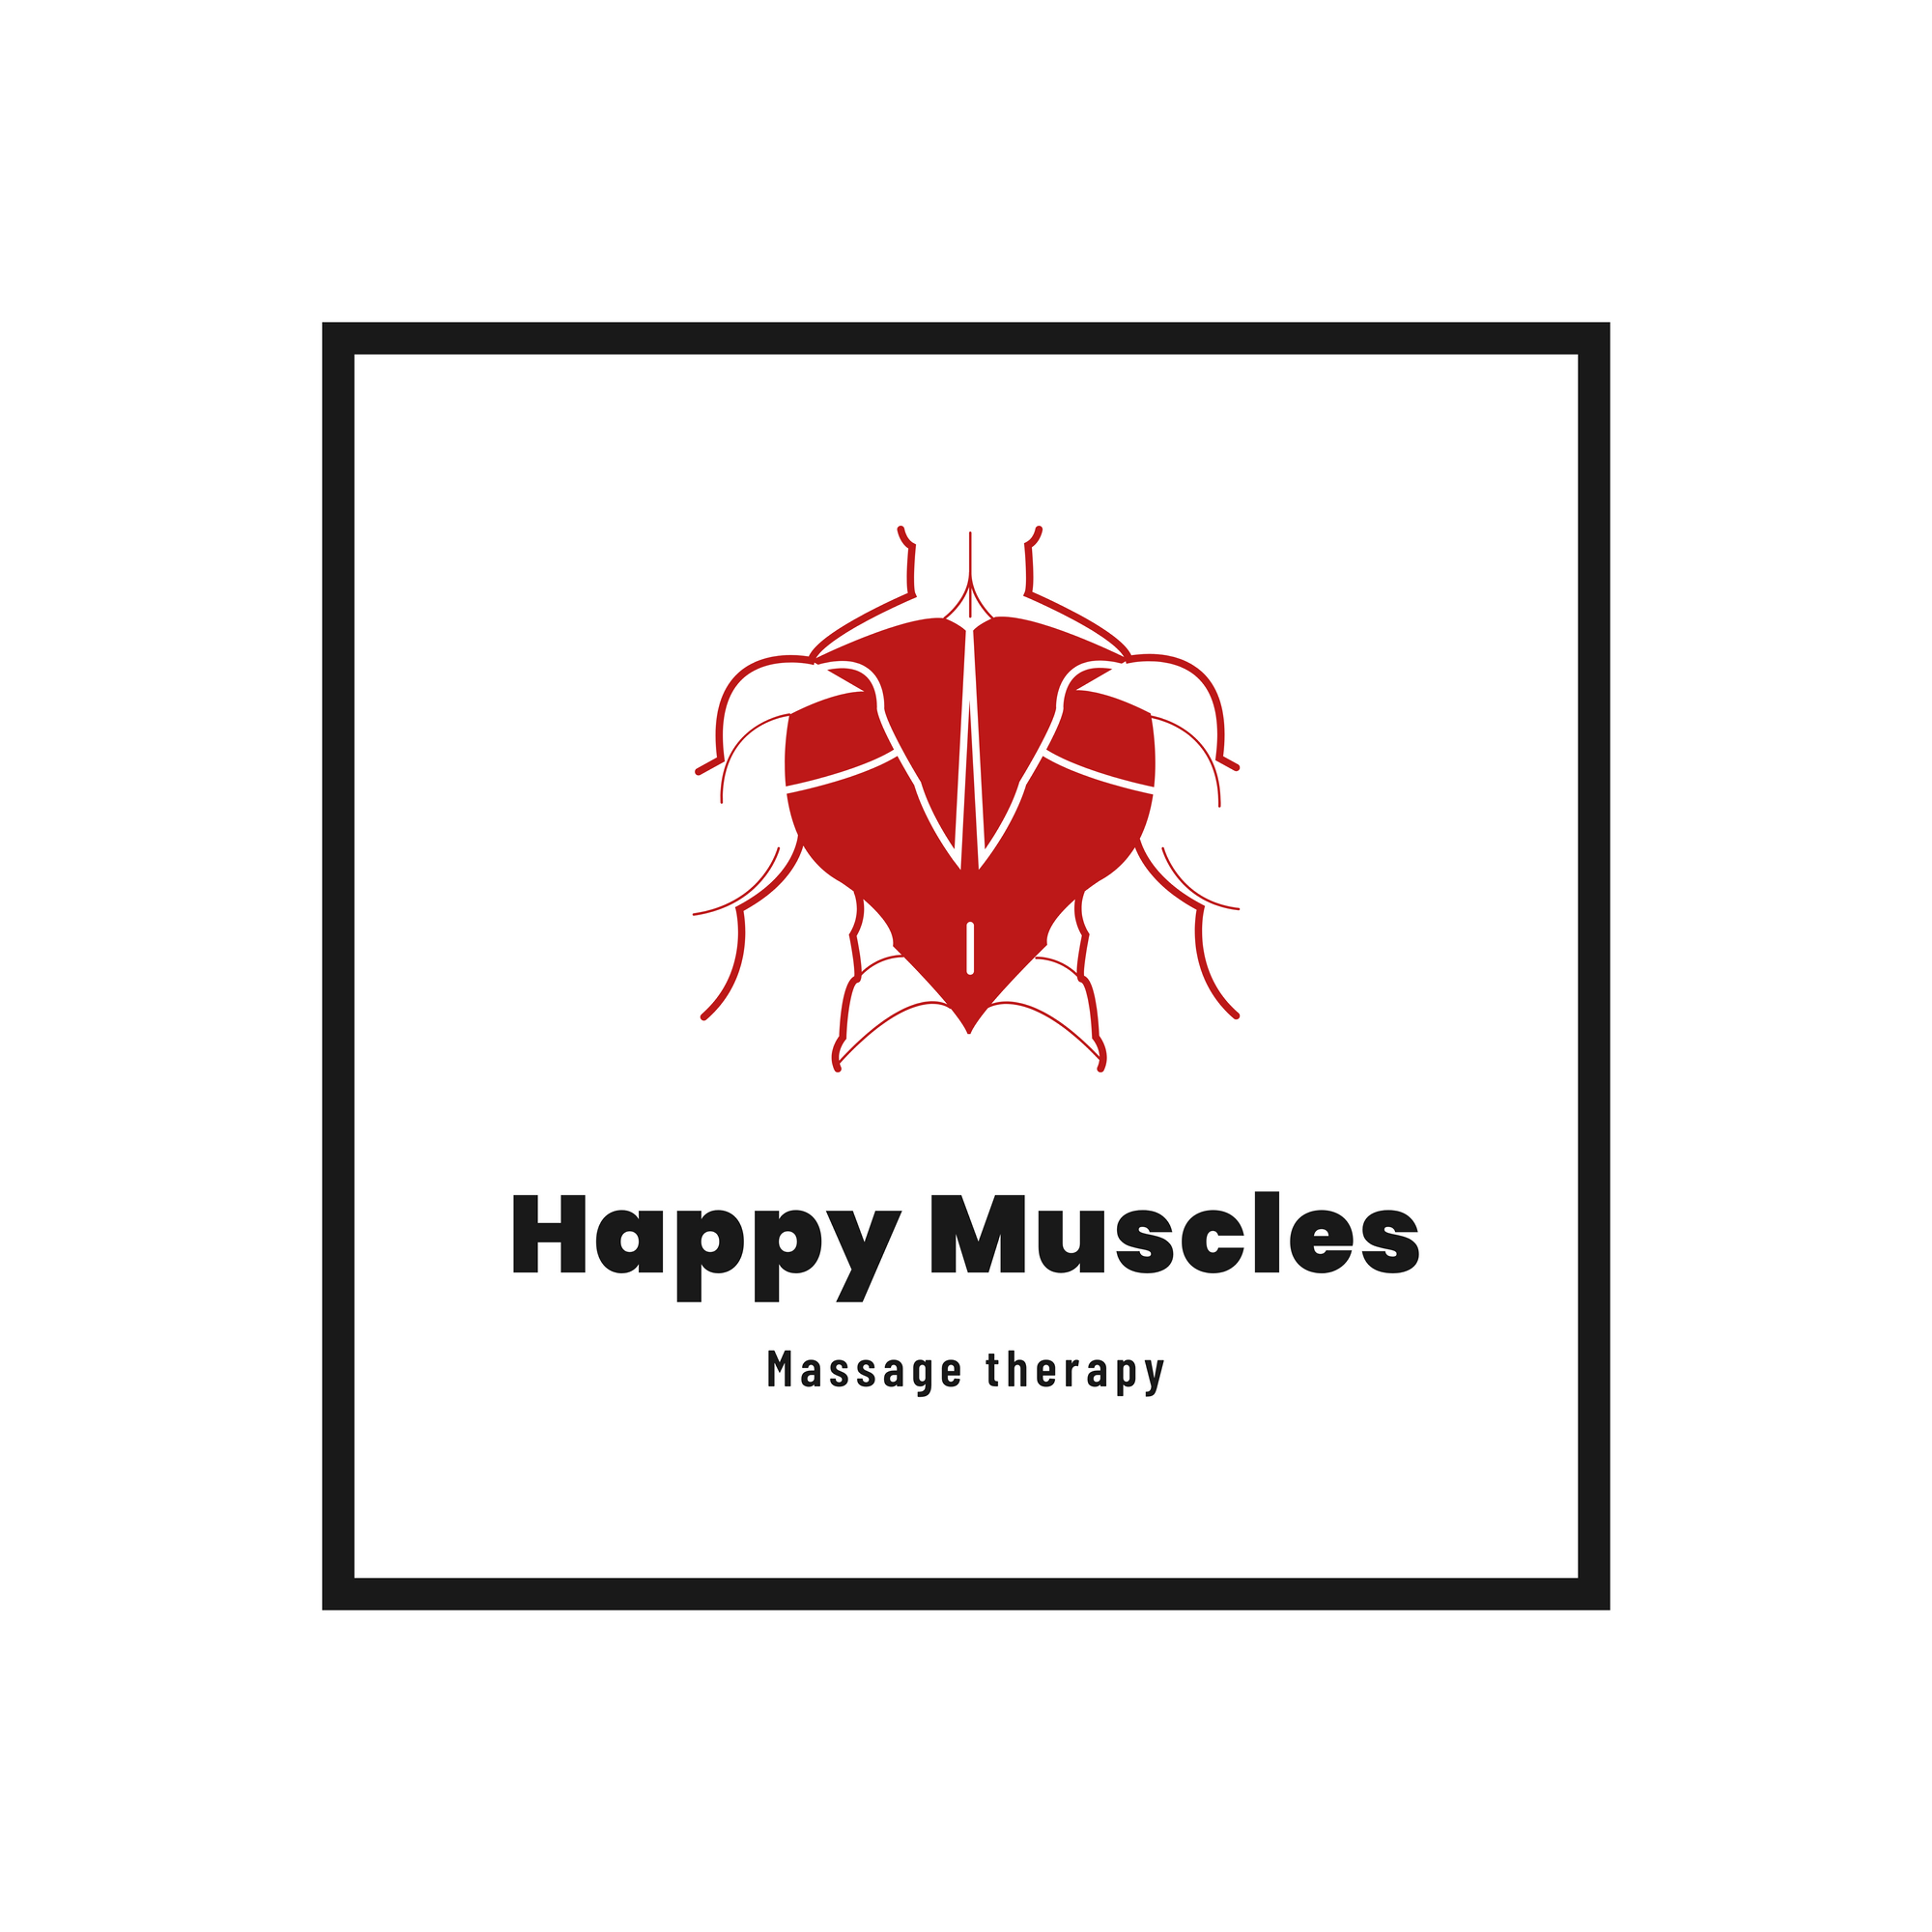 Happy Muscles Original